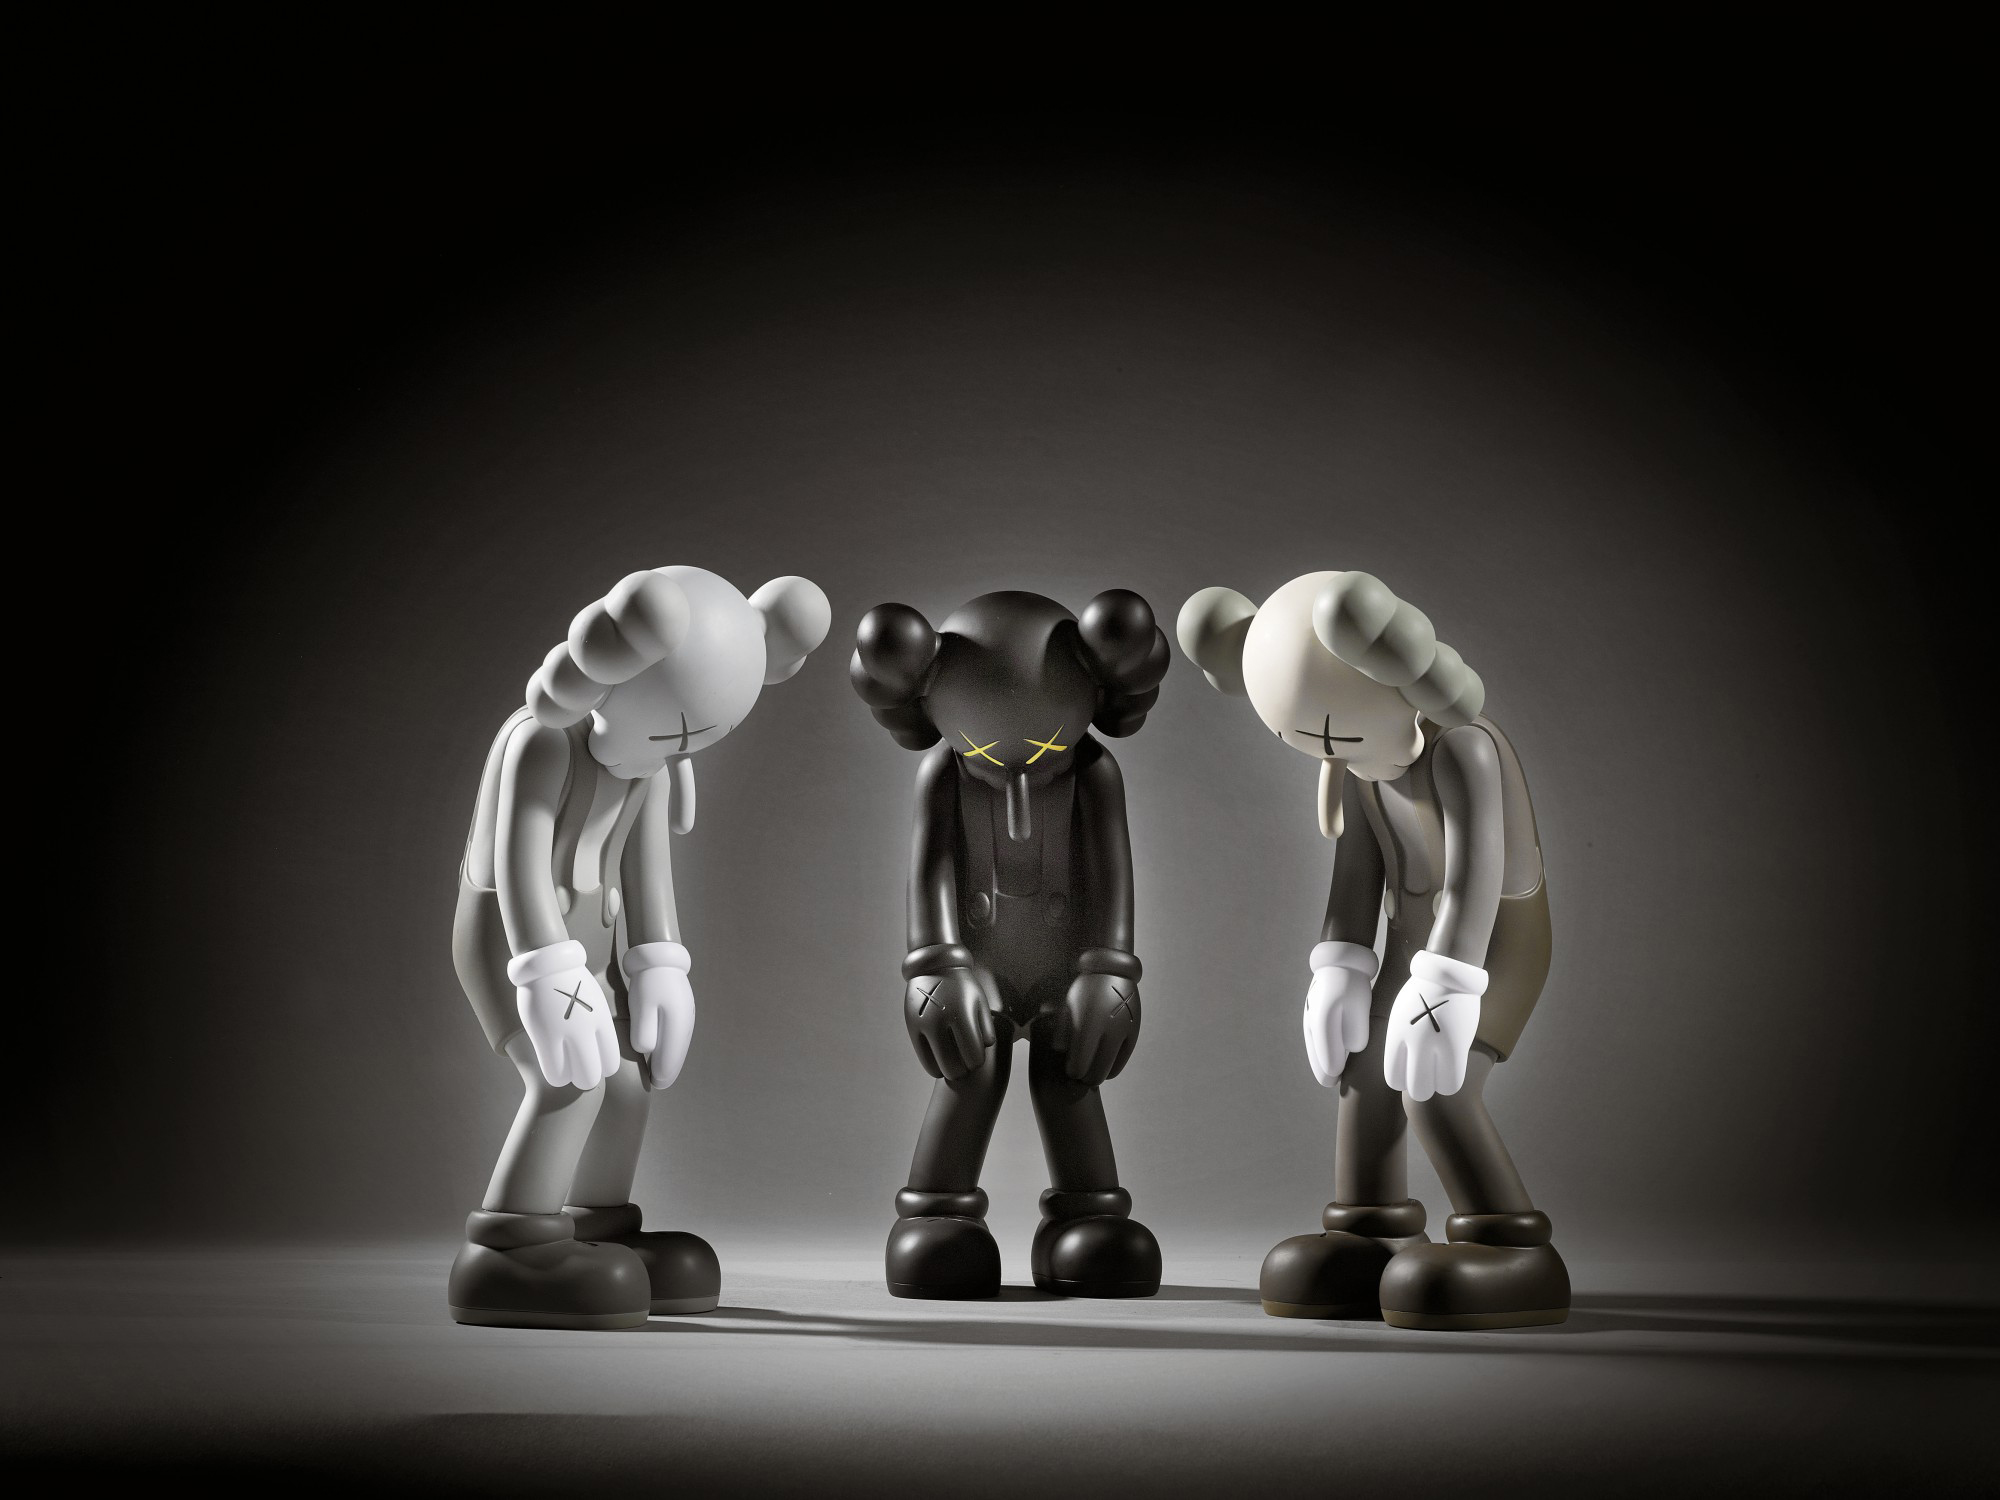 KAWS | SMALL LIE (BROWN); SMALL LIE (BLACK); AND SMALL LIE (GREY)